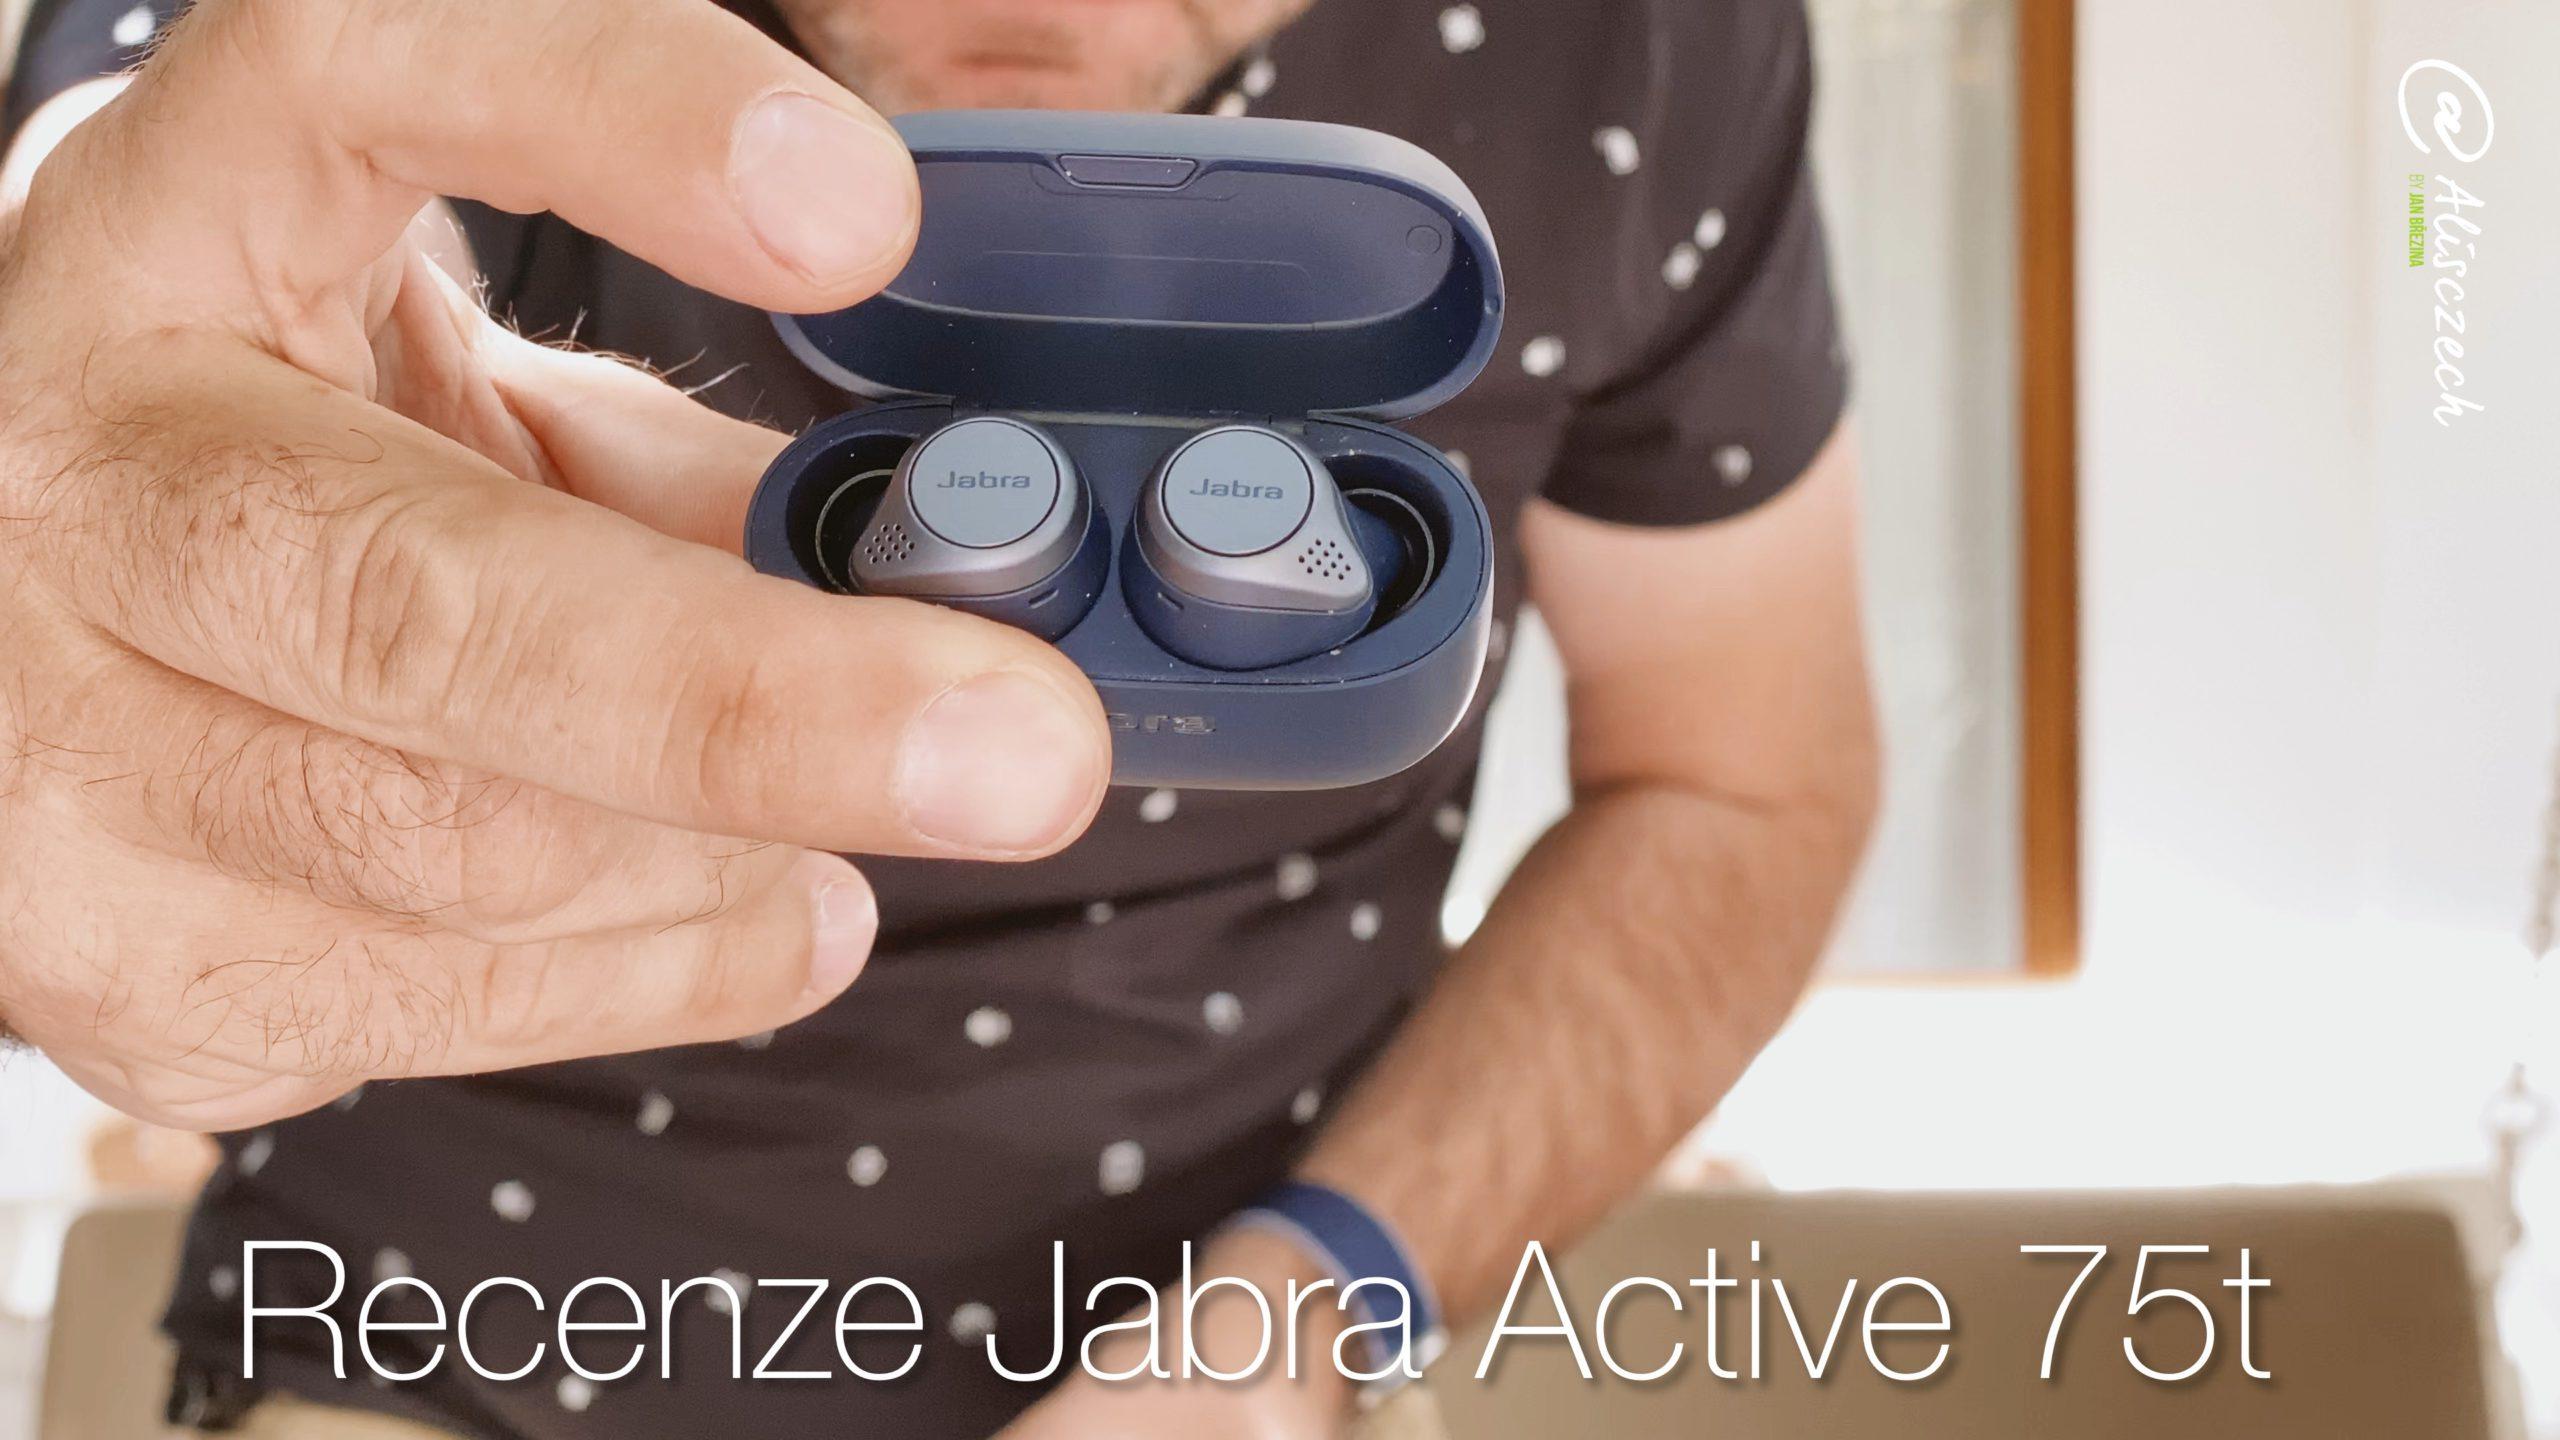 Jabra Active 75t